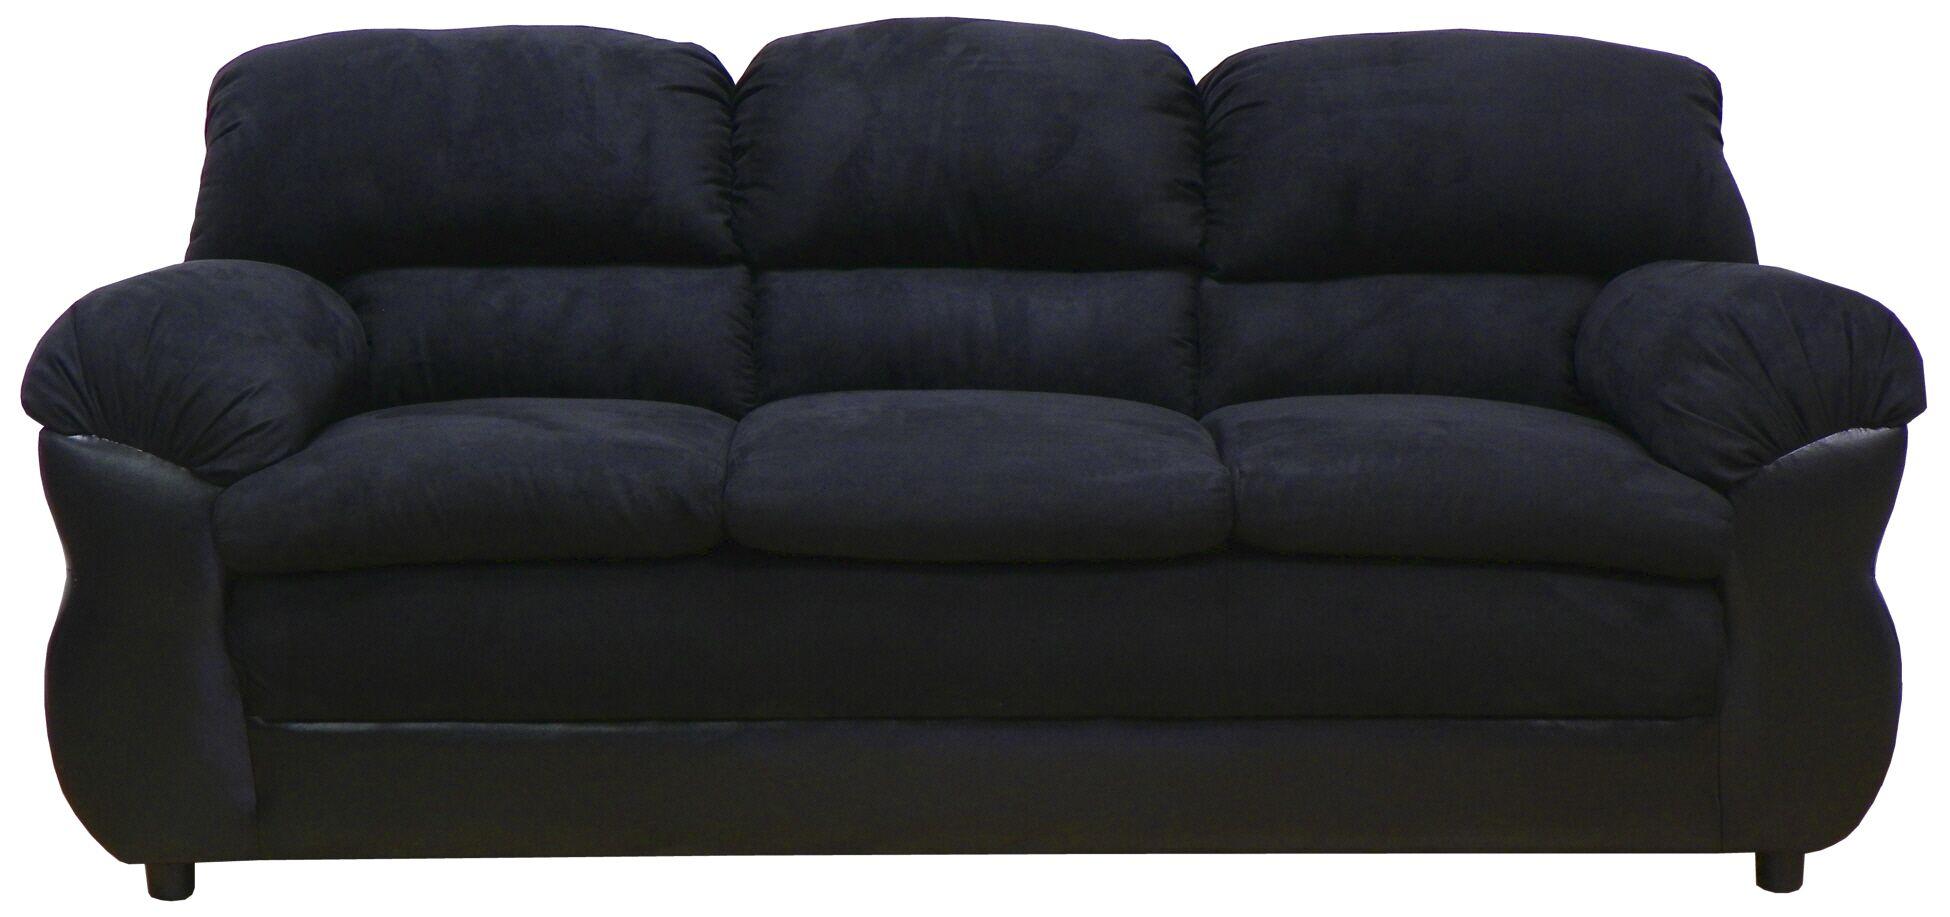 Abigail Sofa Upholstery: Bulldozer Black / San Marino Black